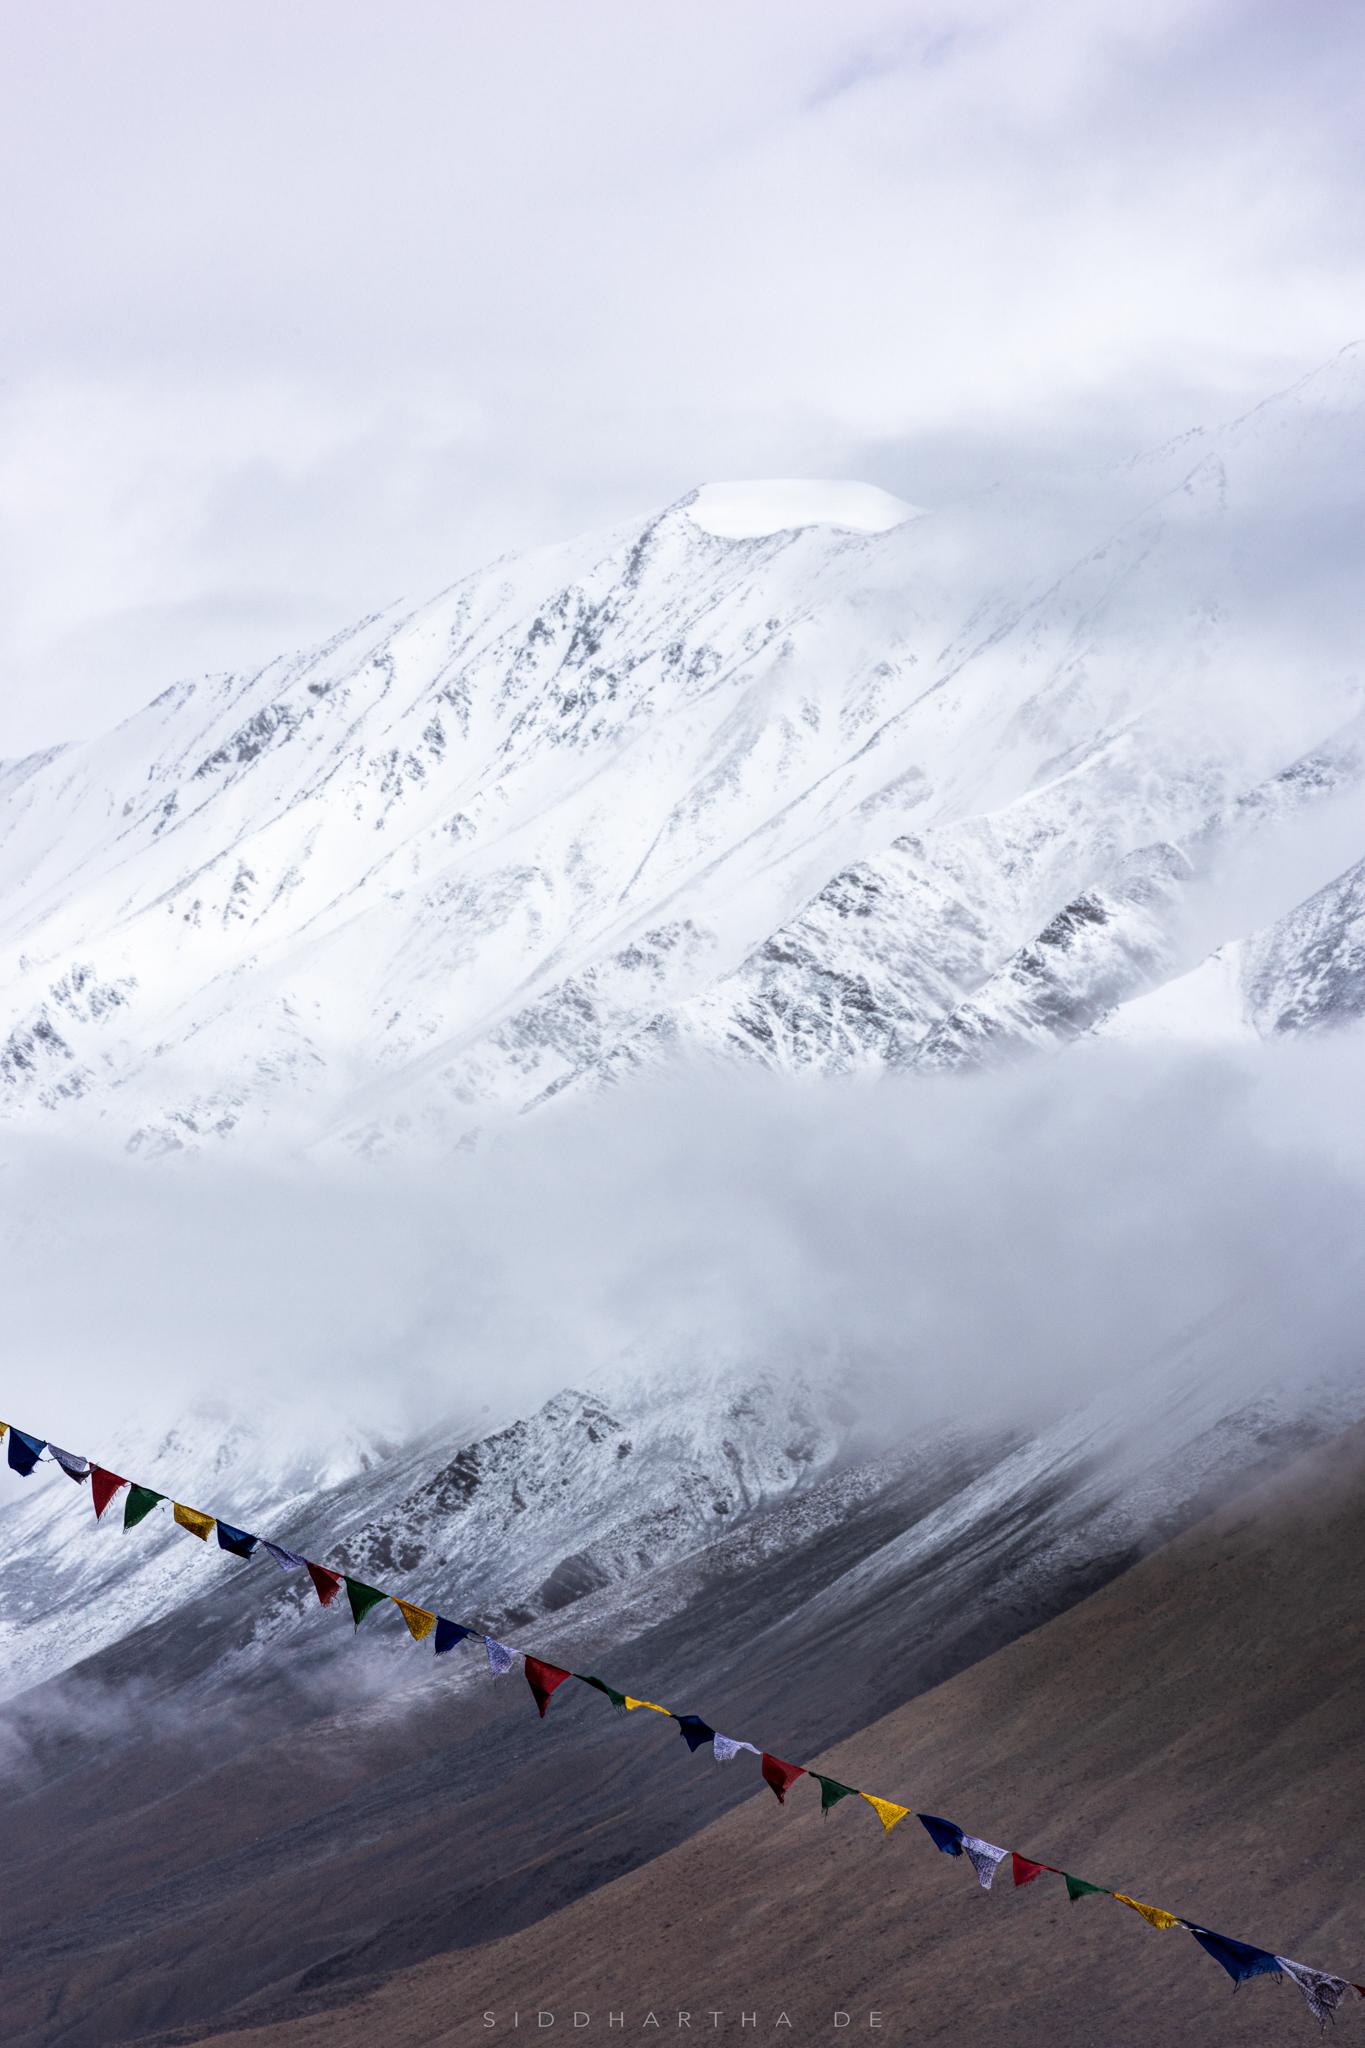 SD Ladakh 2019 08.jpg